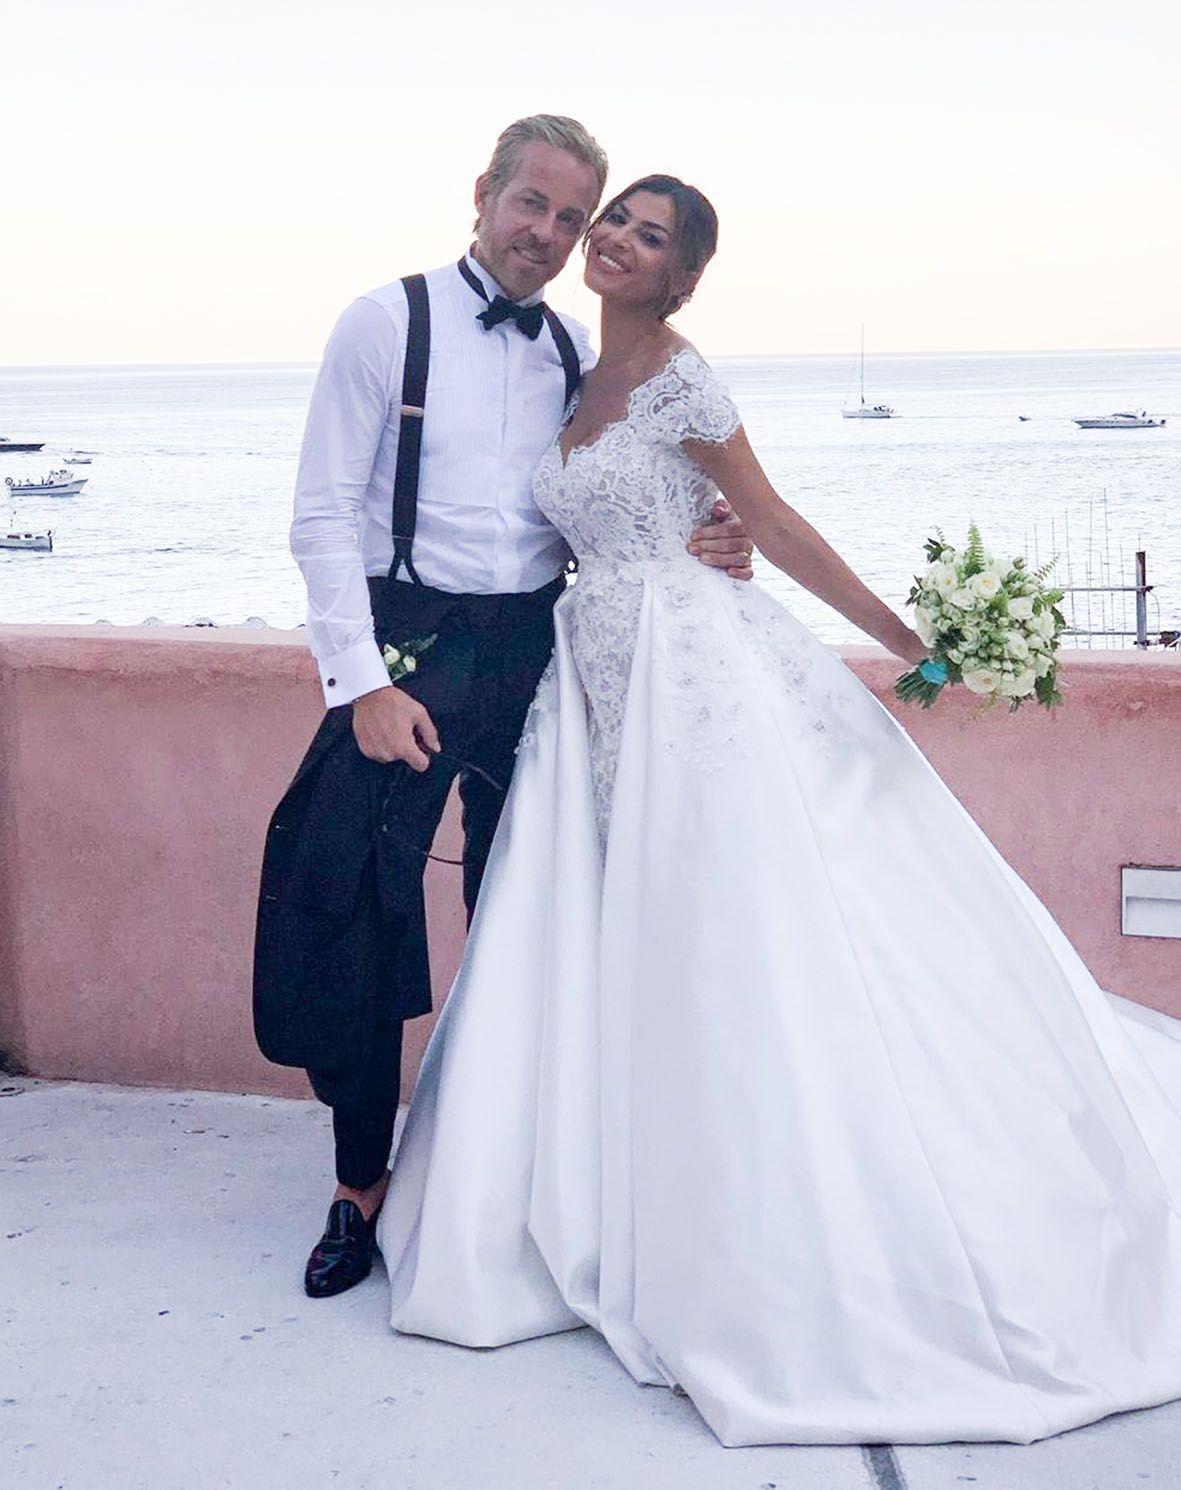 Susanna Petrone e Marco Cipriano nozze